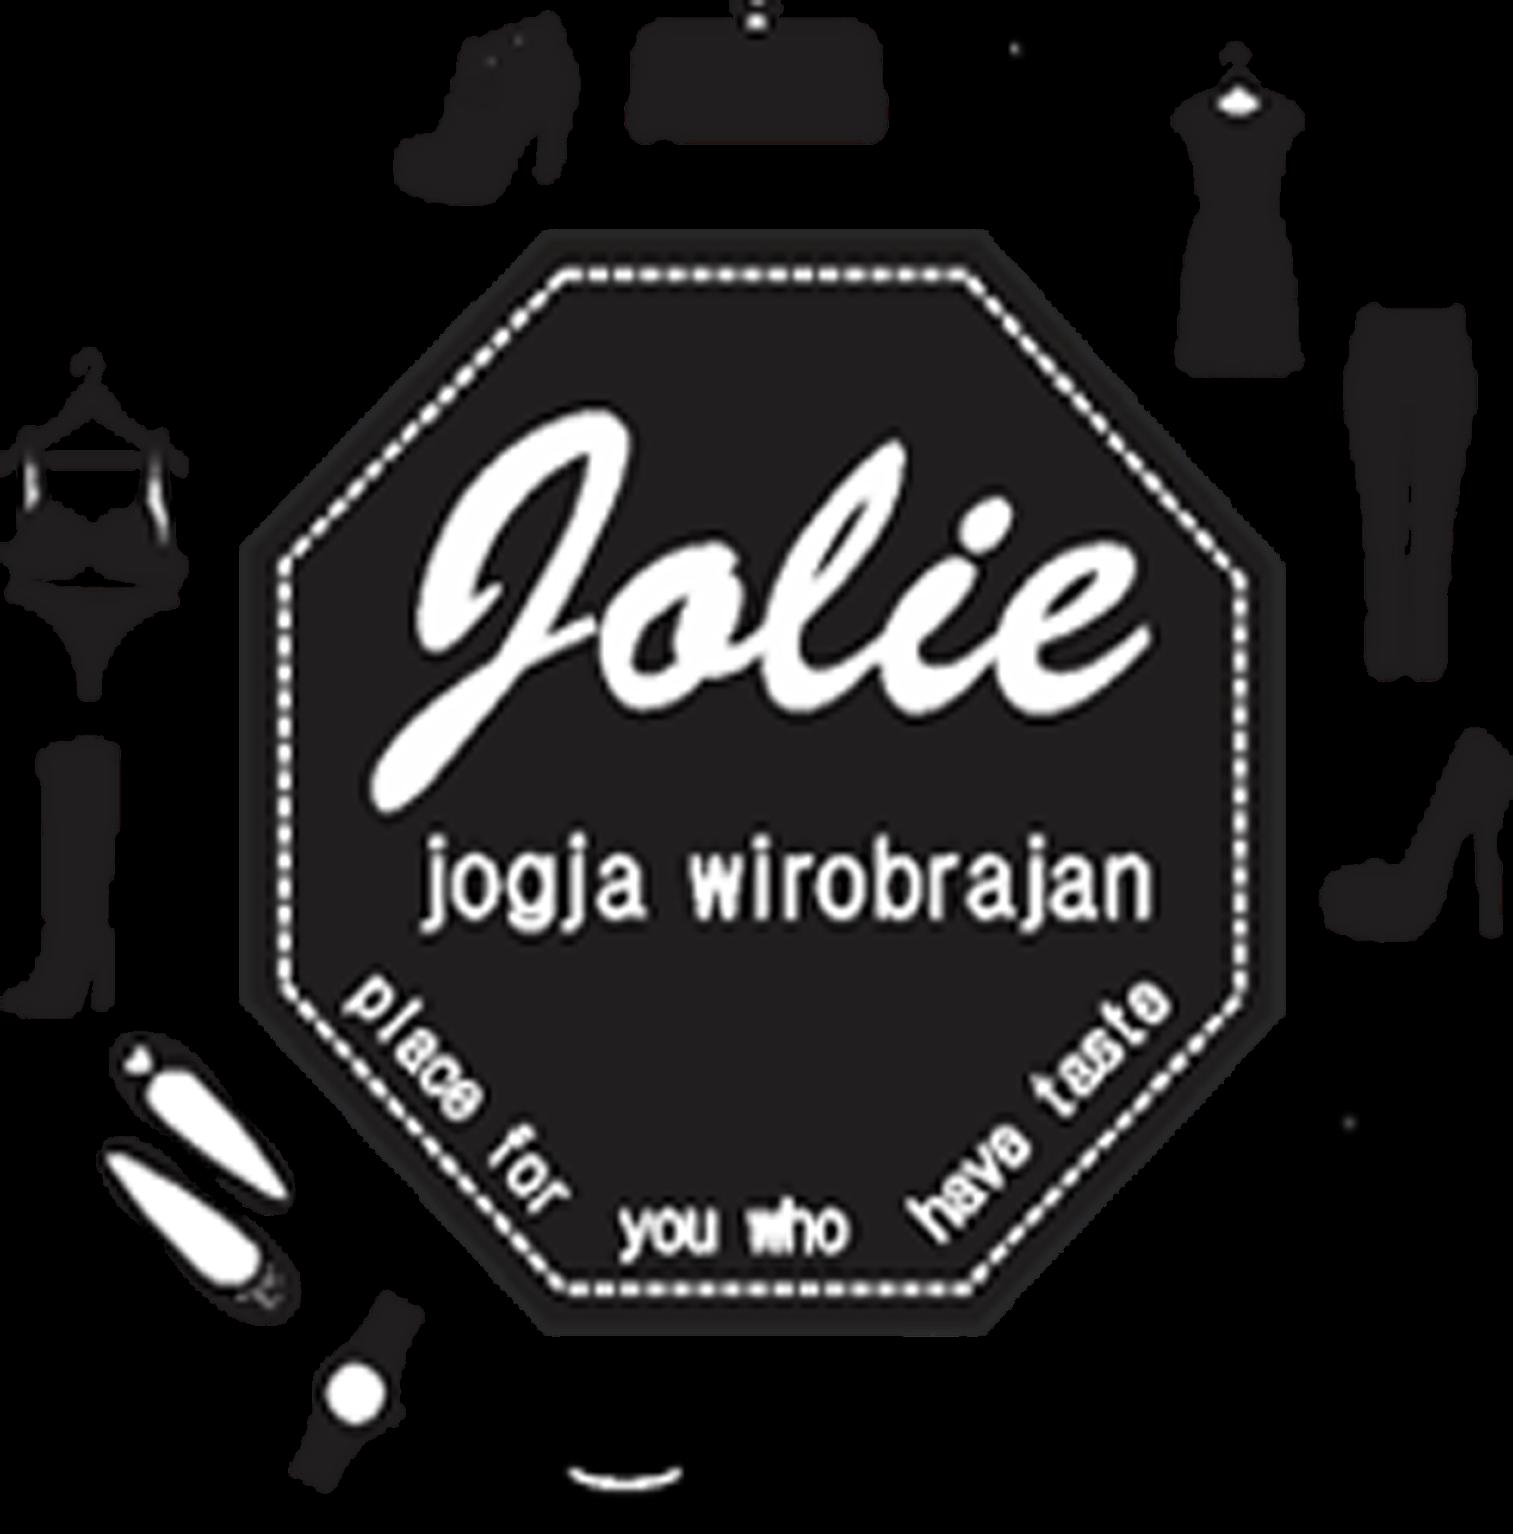 Jobjogja Lowongan Pramuniaga Di Jolie Jogja Wirobrajan Yogyakarta Gaji Umr Yogyakarta